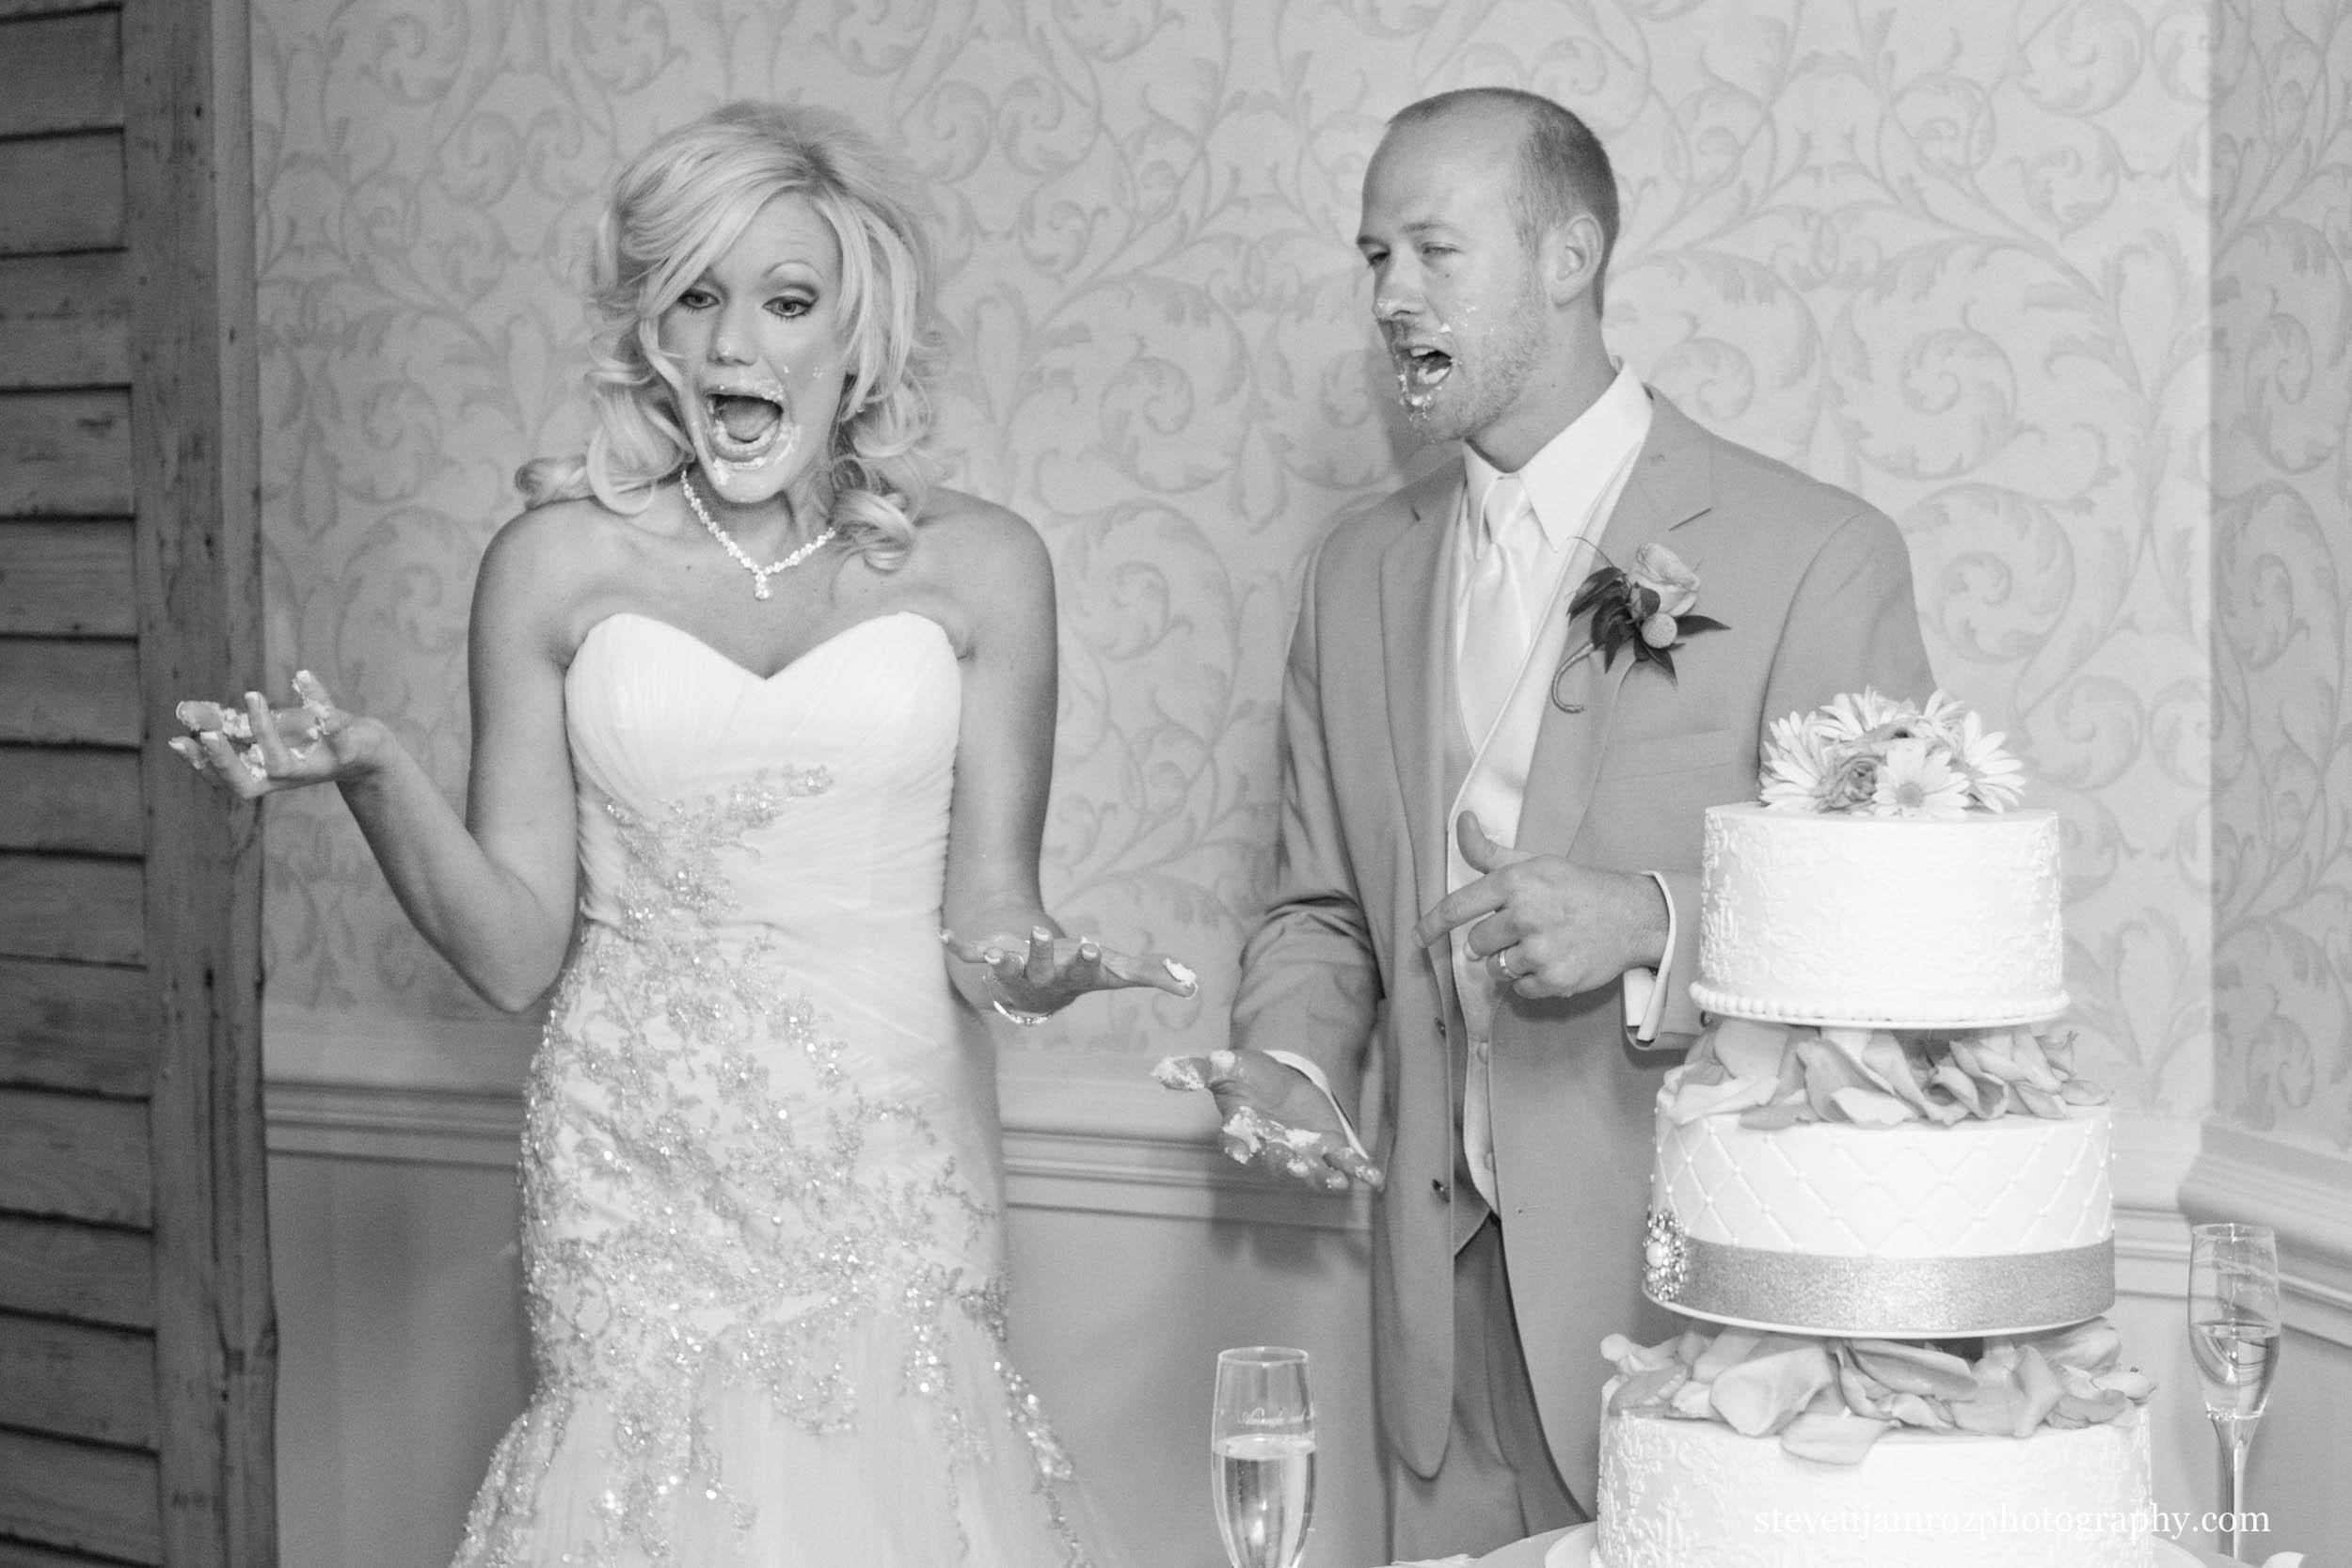 cake-in-face-bride-groom-raleigh-cc-steven-jamroz-photography-0170.jpg